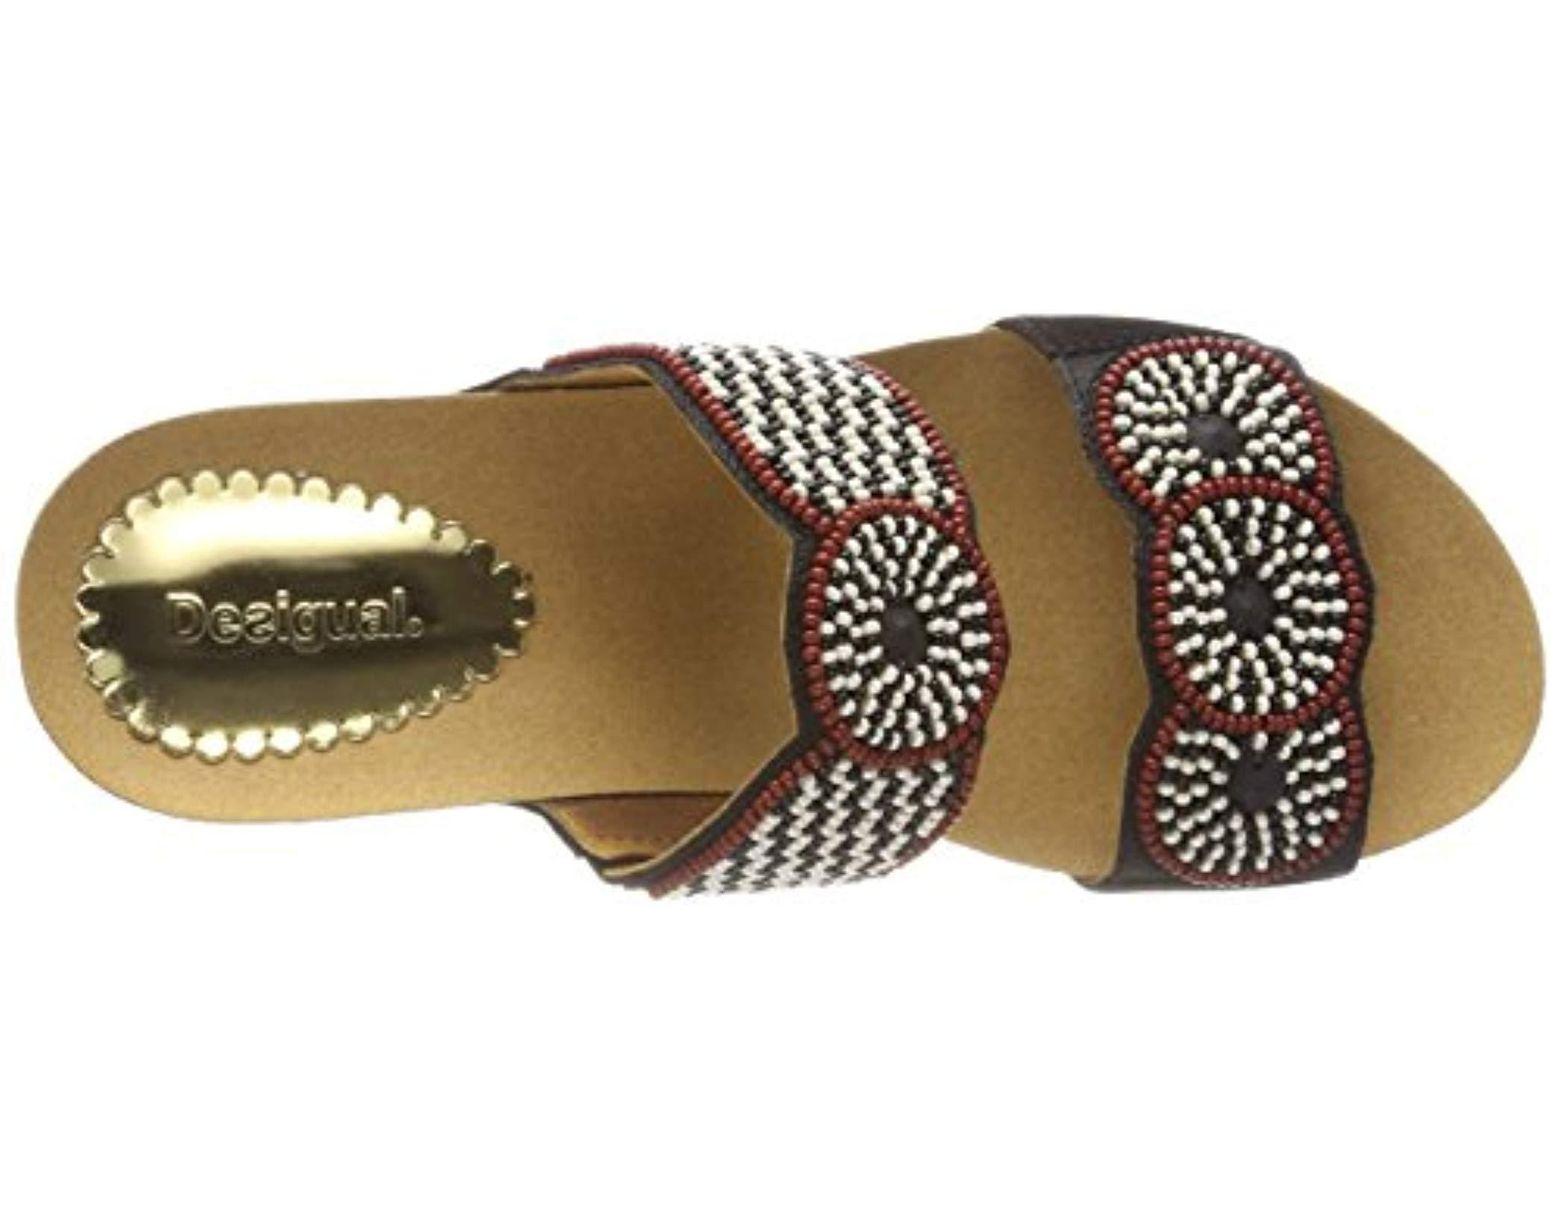 8abd67ec20 Desigual Shoes_cycle Africa Bn Flatform Sandals in Black - Lyst